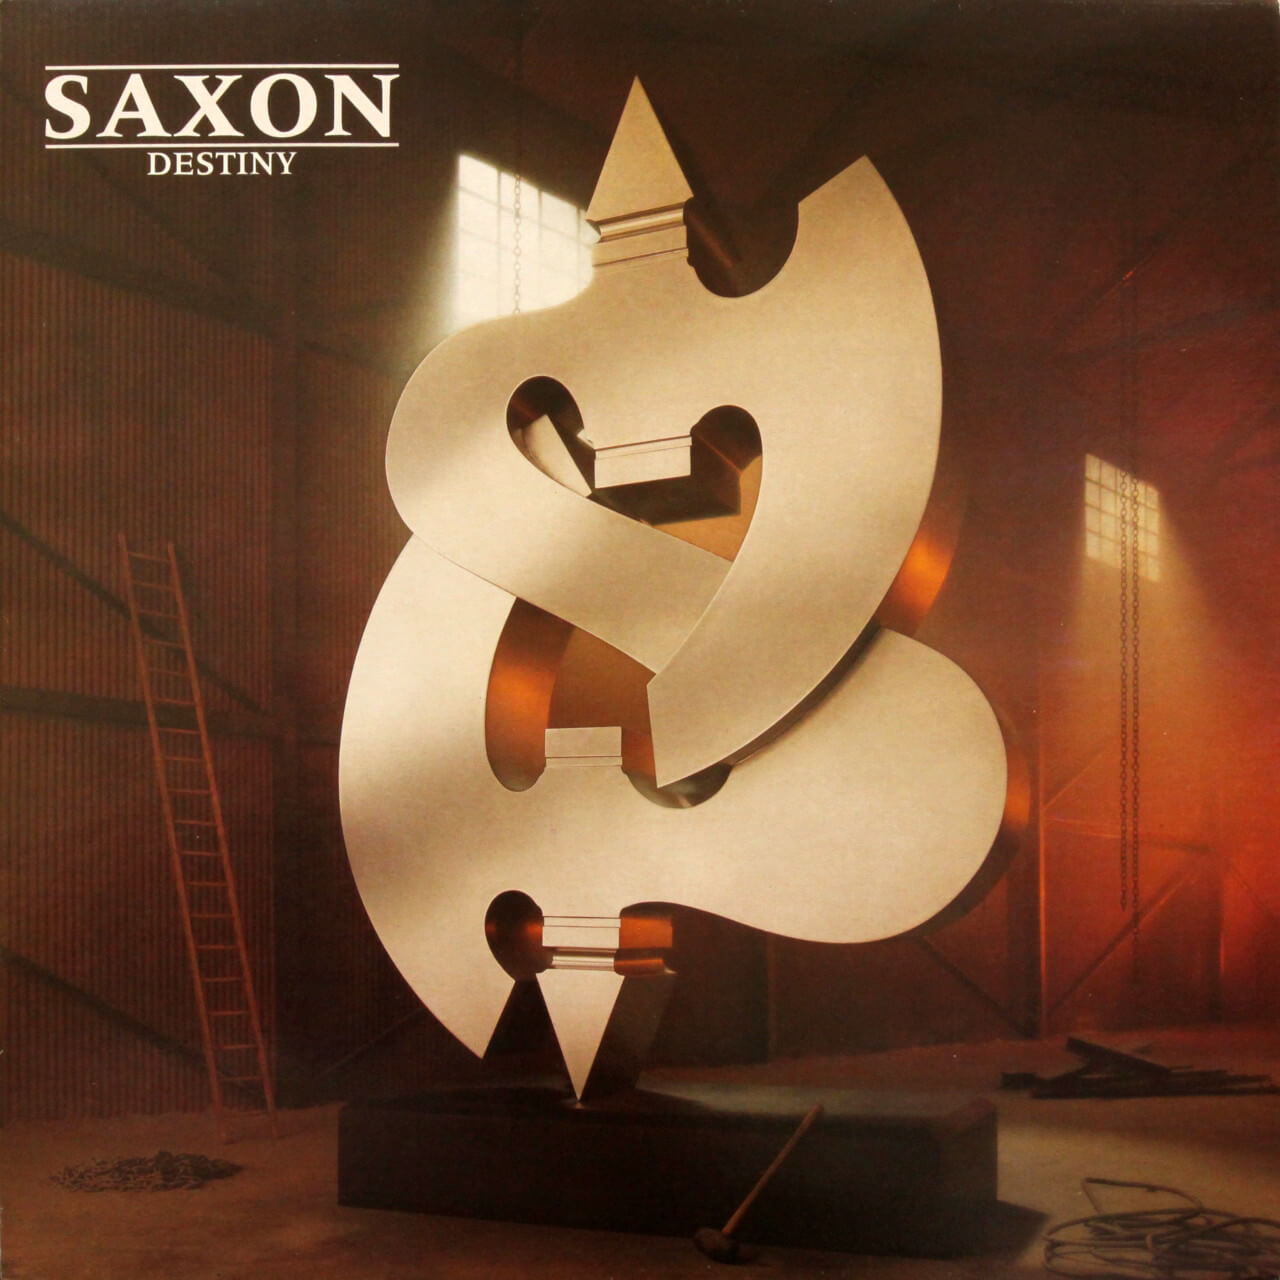 Destin saxon